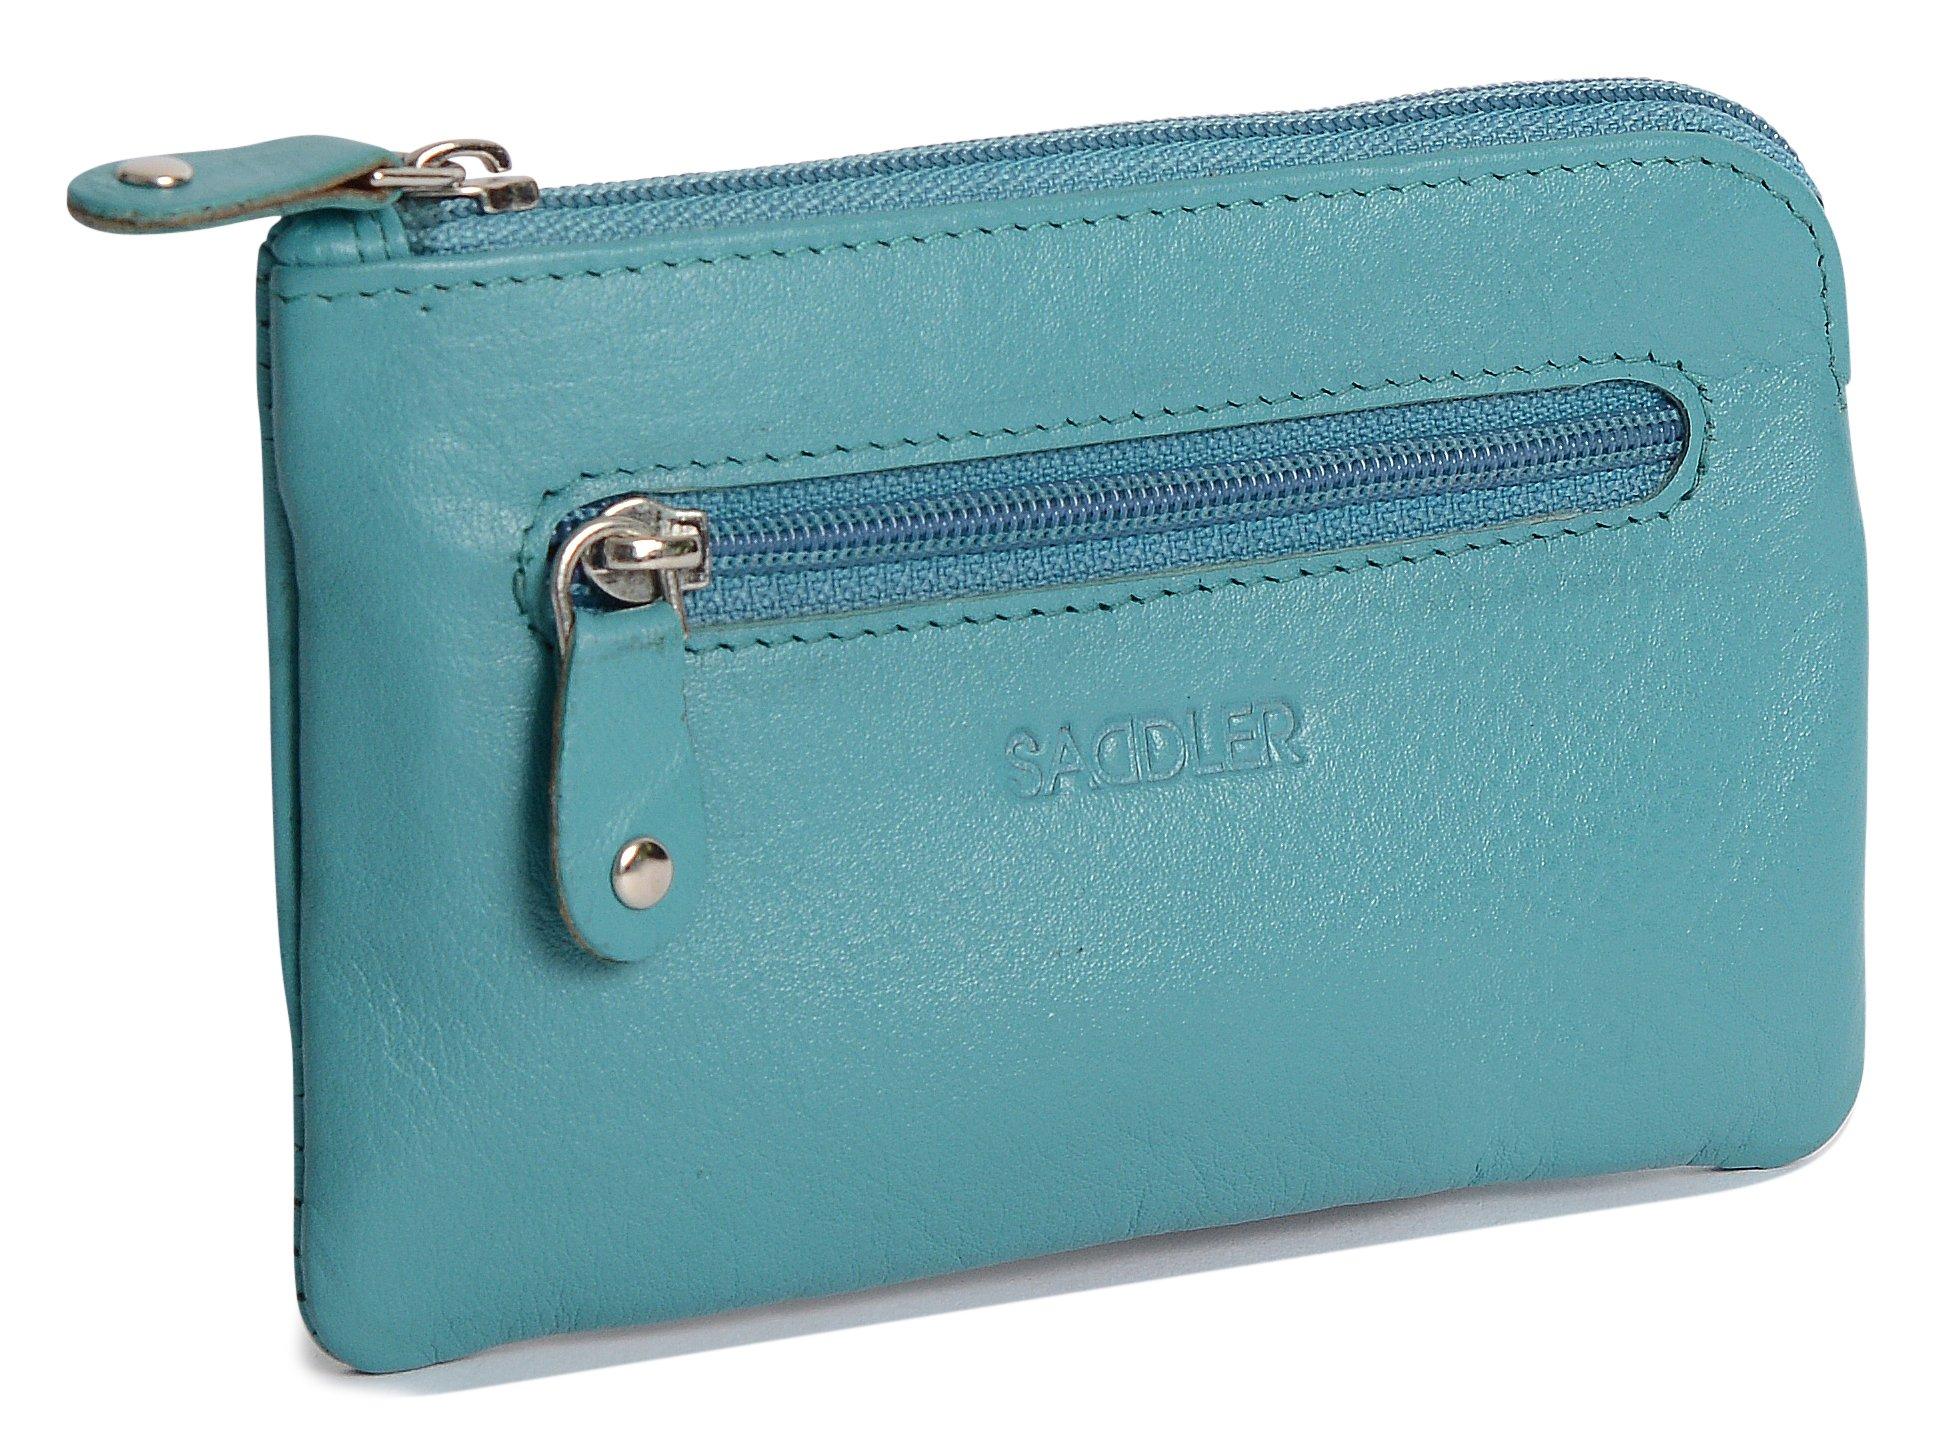 SADDLER Womens Real Leather Rectangular Zipper Top Coins & Key Purse - Teal Blue